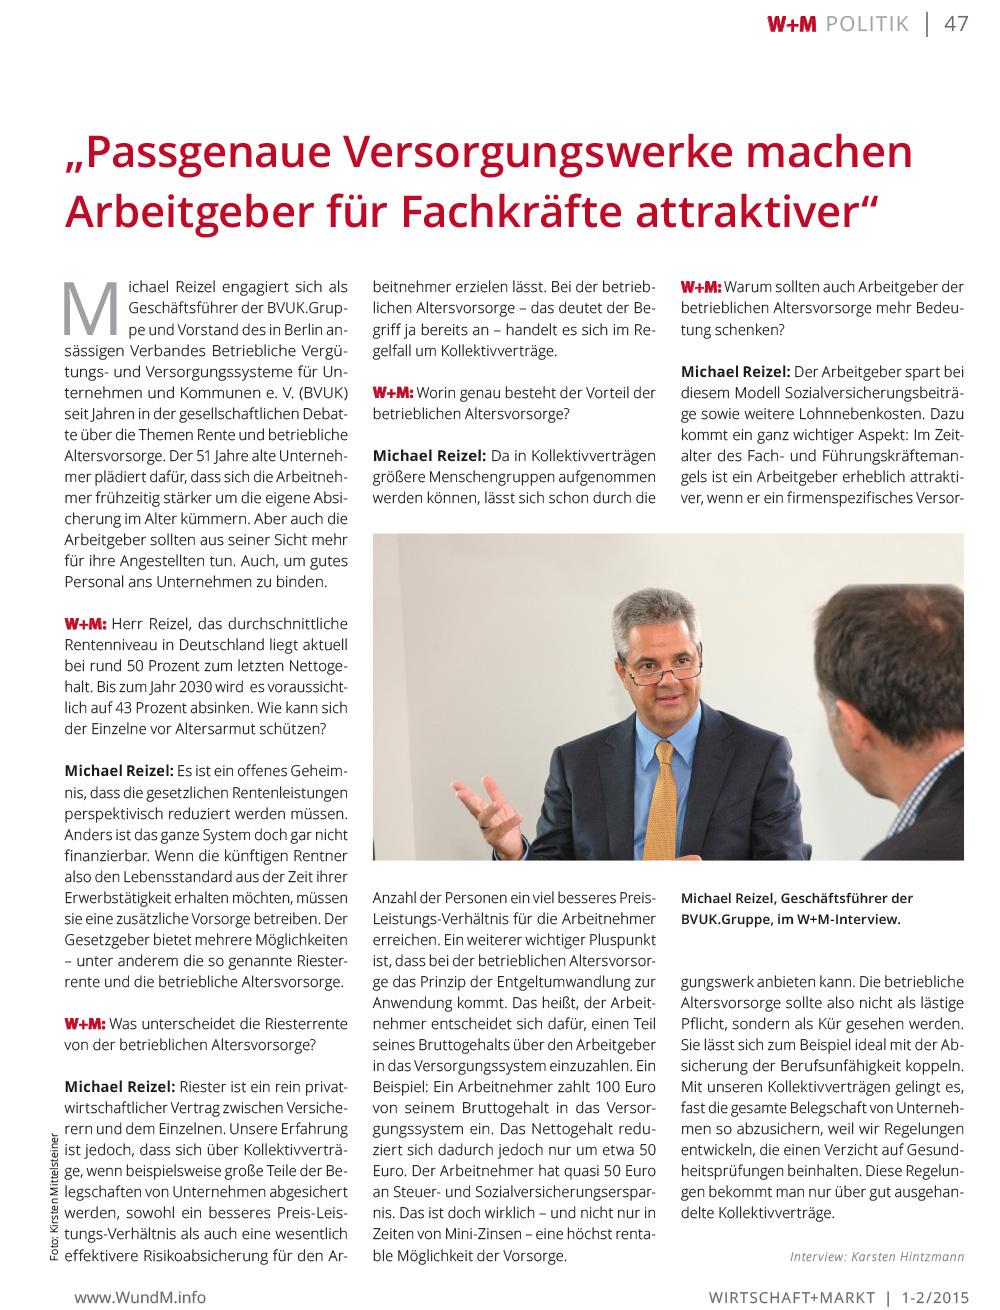 Ratgeber_BVUK_passgenaue_versorgungswerke